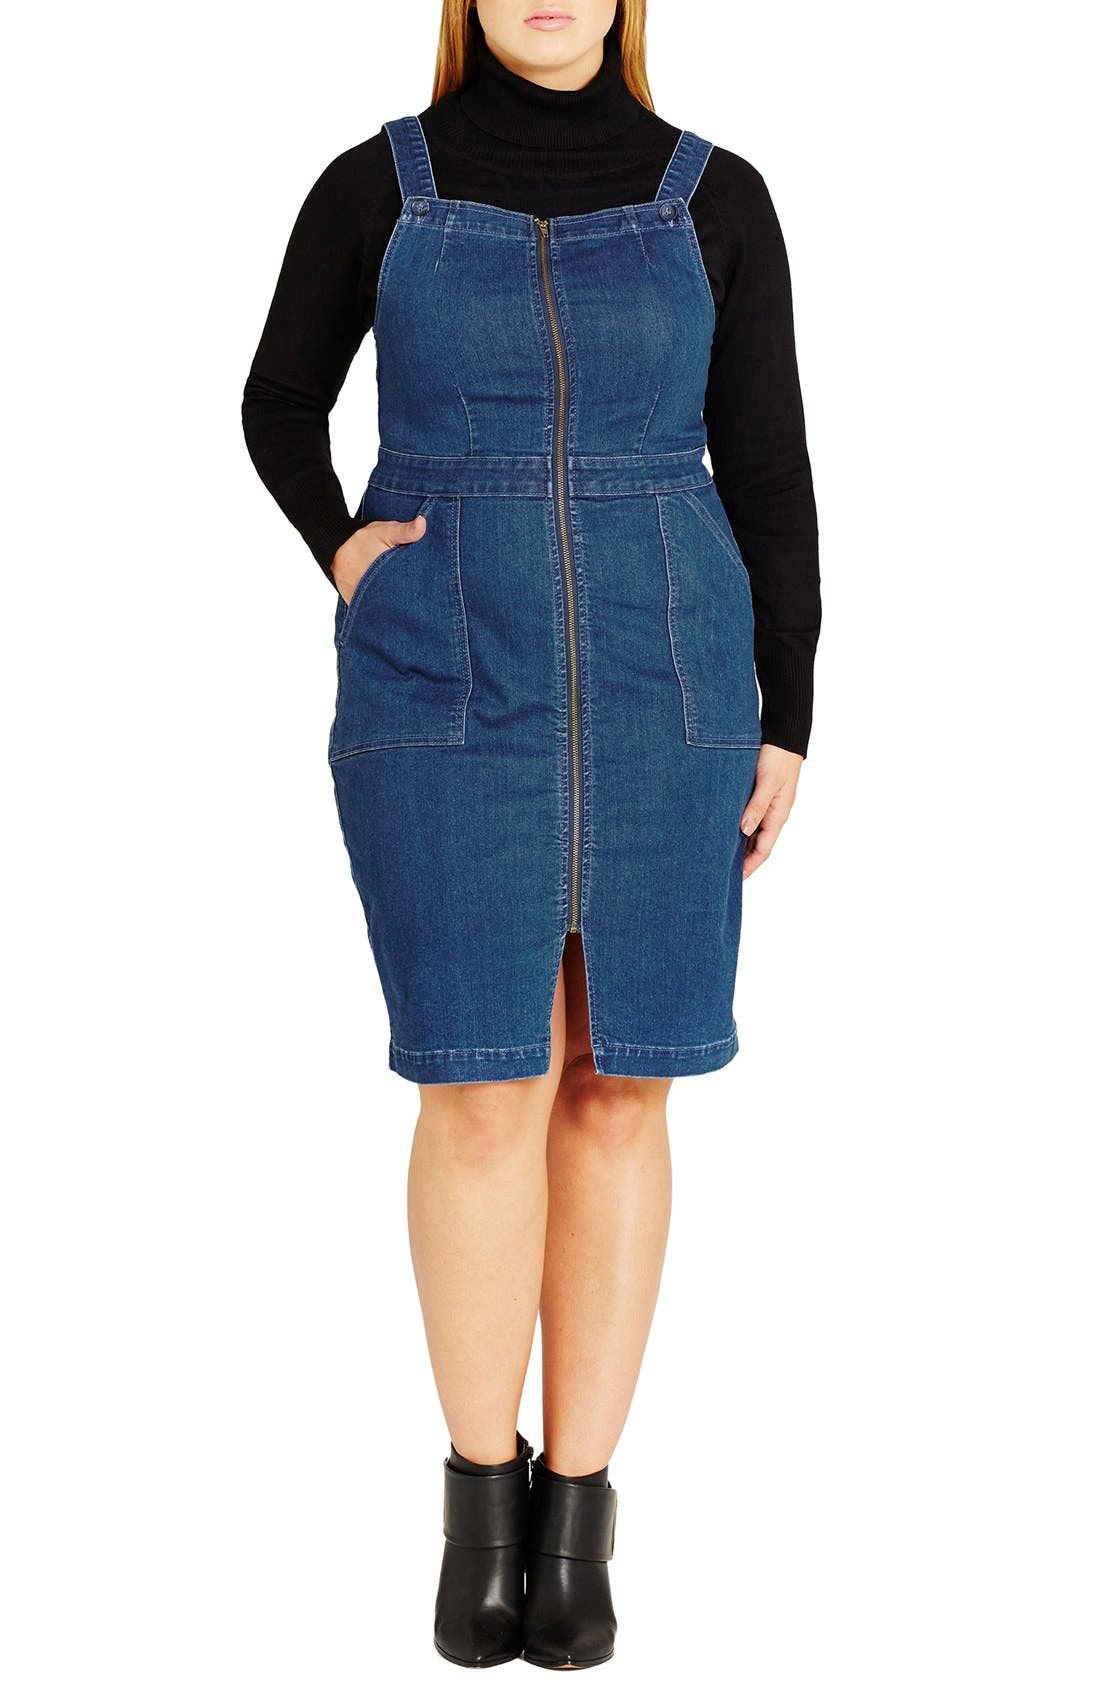 CITY CHIC Denim Front Zip Pinafore Dress